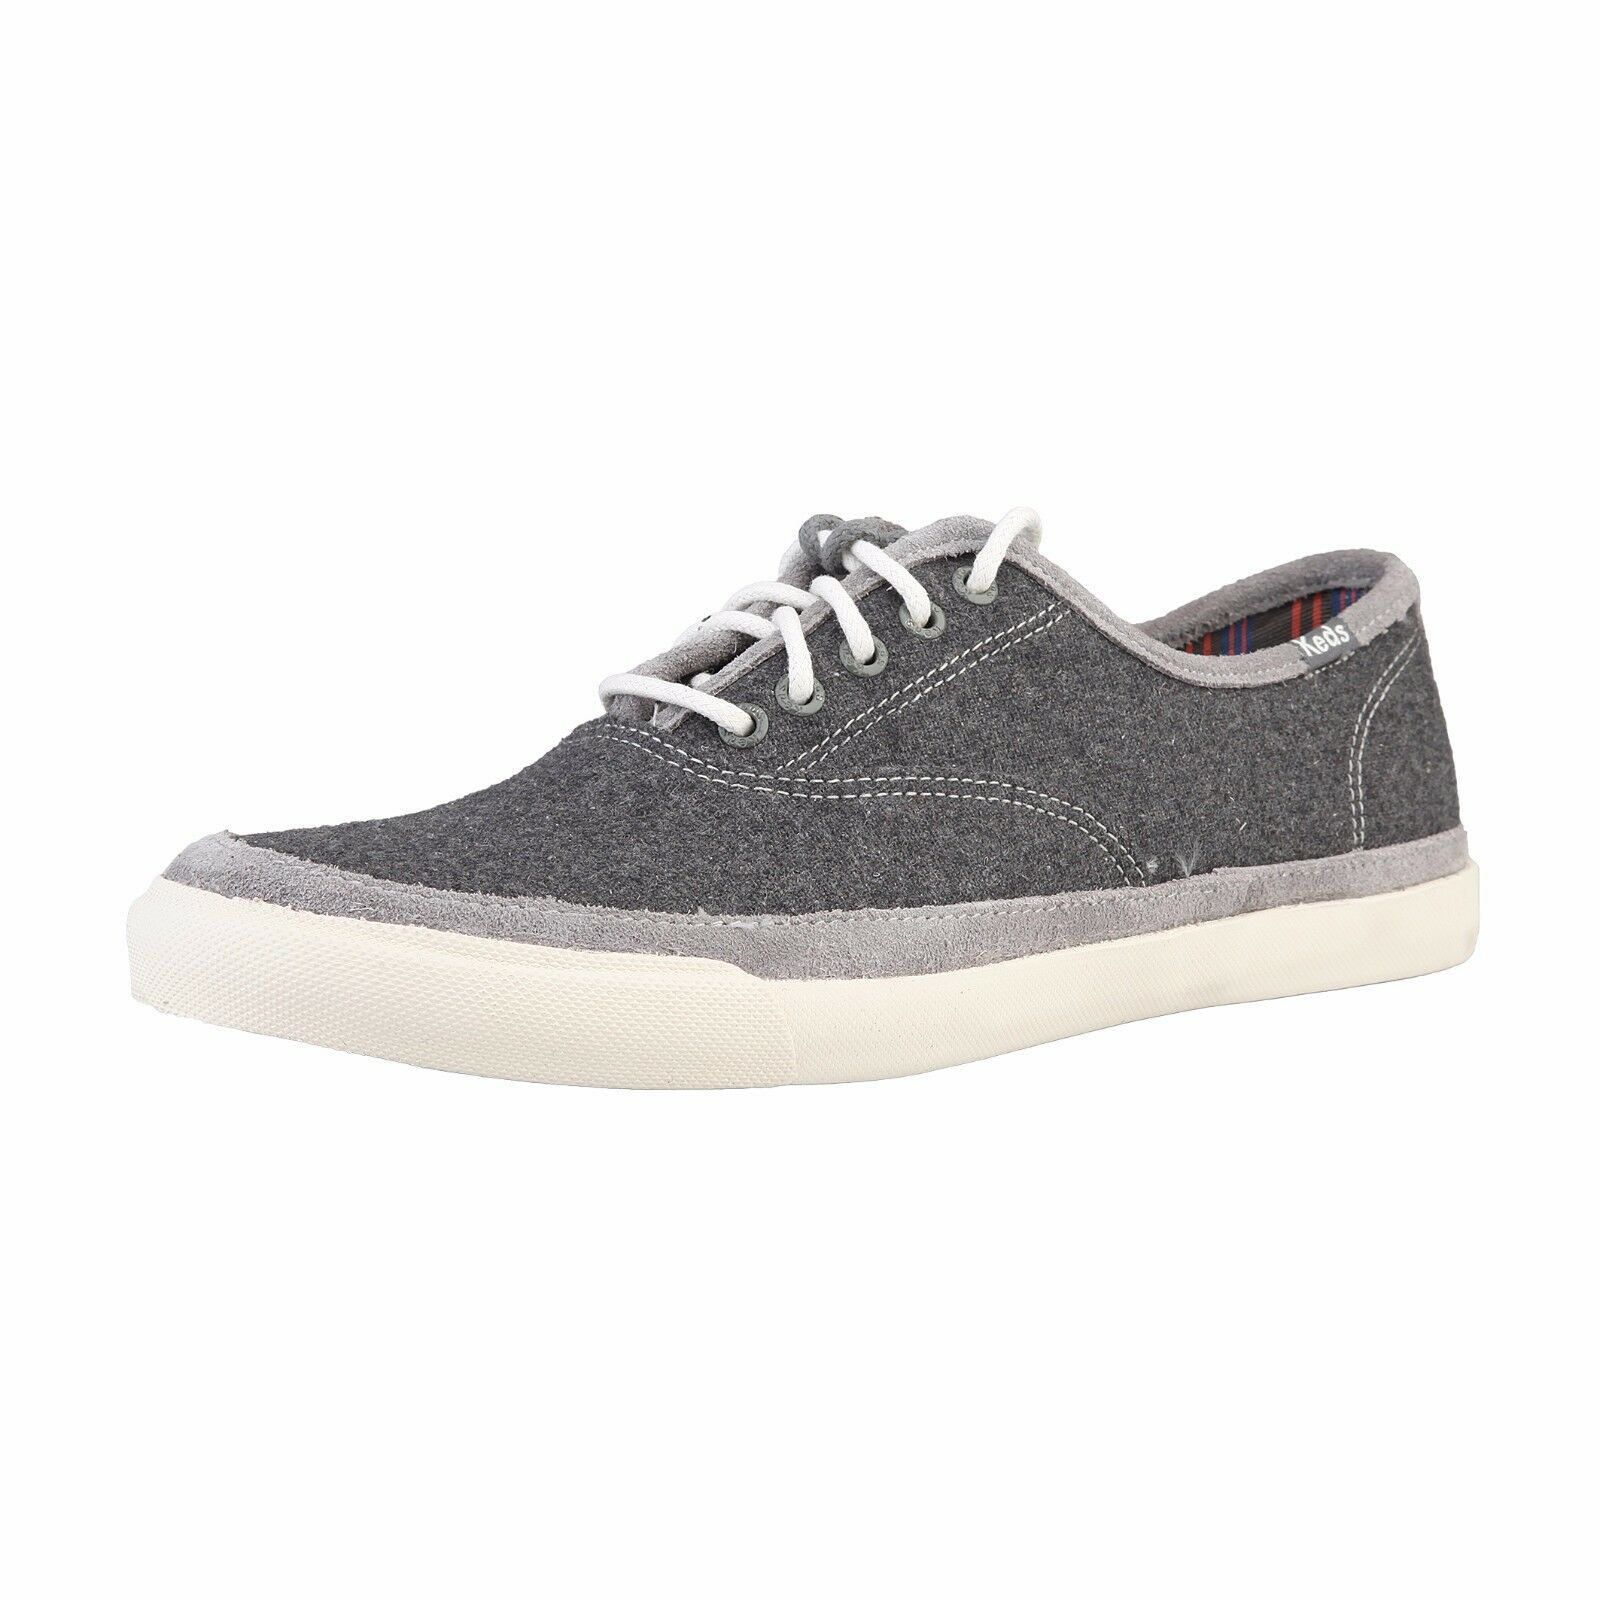 KEDS CHAMPION CVO MF48083 Herrenschuhe Sneakers Turnschuhe, Gr. 40.5, 42, Grau